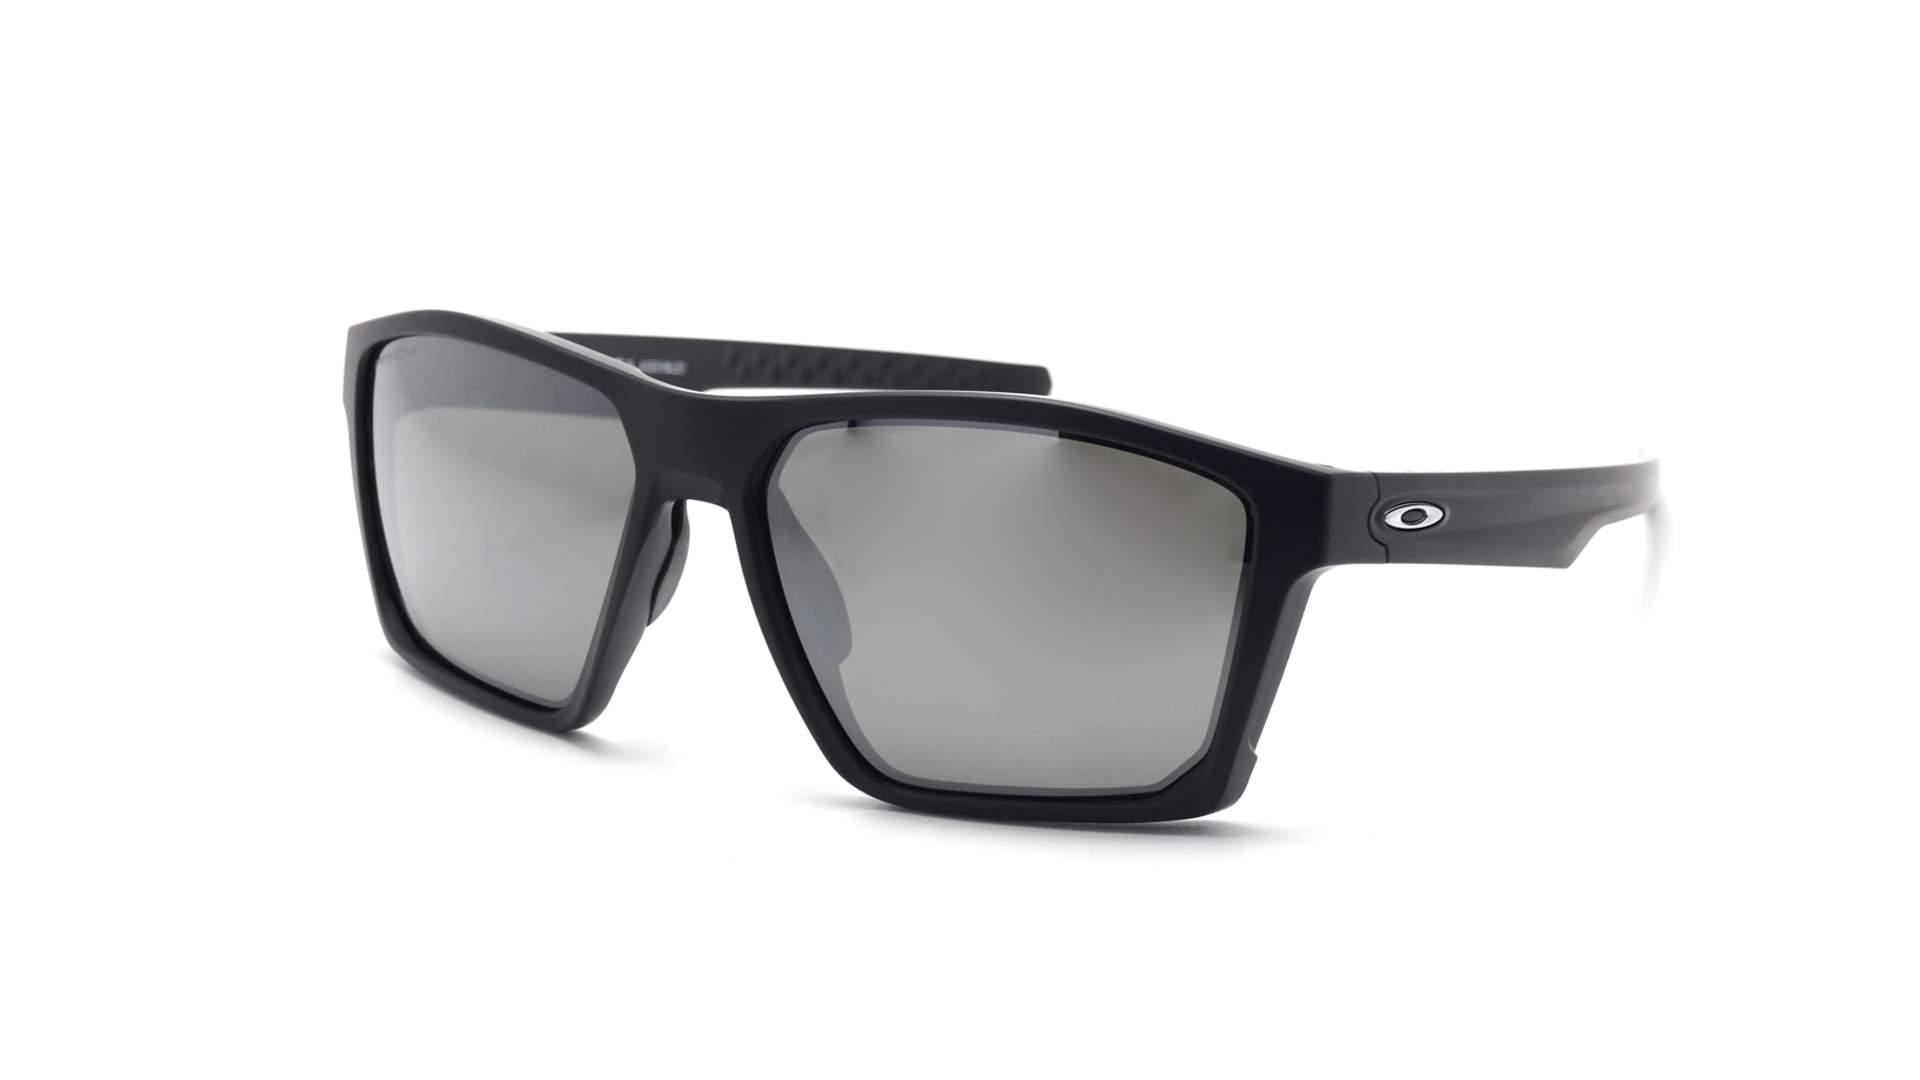 154367ce40 Sunglasses Oakley Targetline Matte black Black Matte Prizm OO9397 02 58-16  Medium Mirror